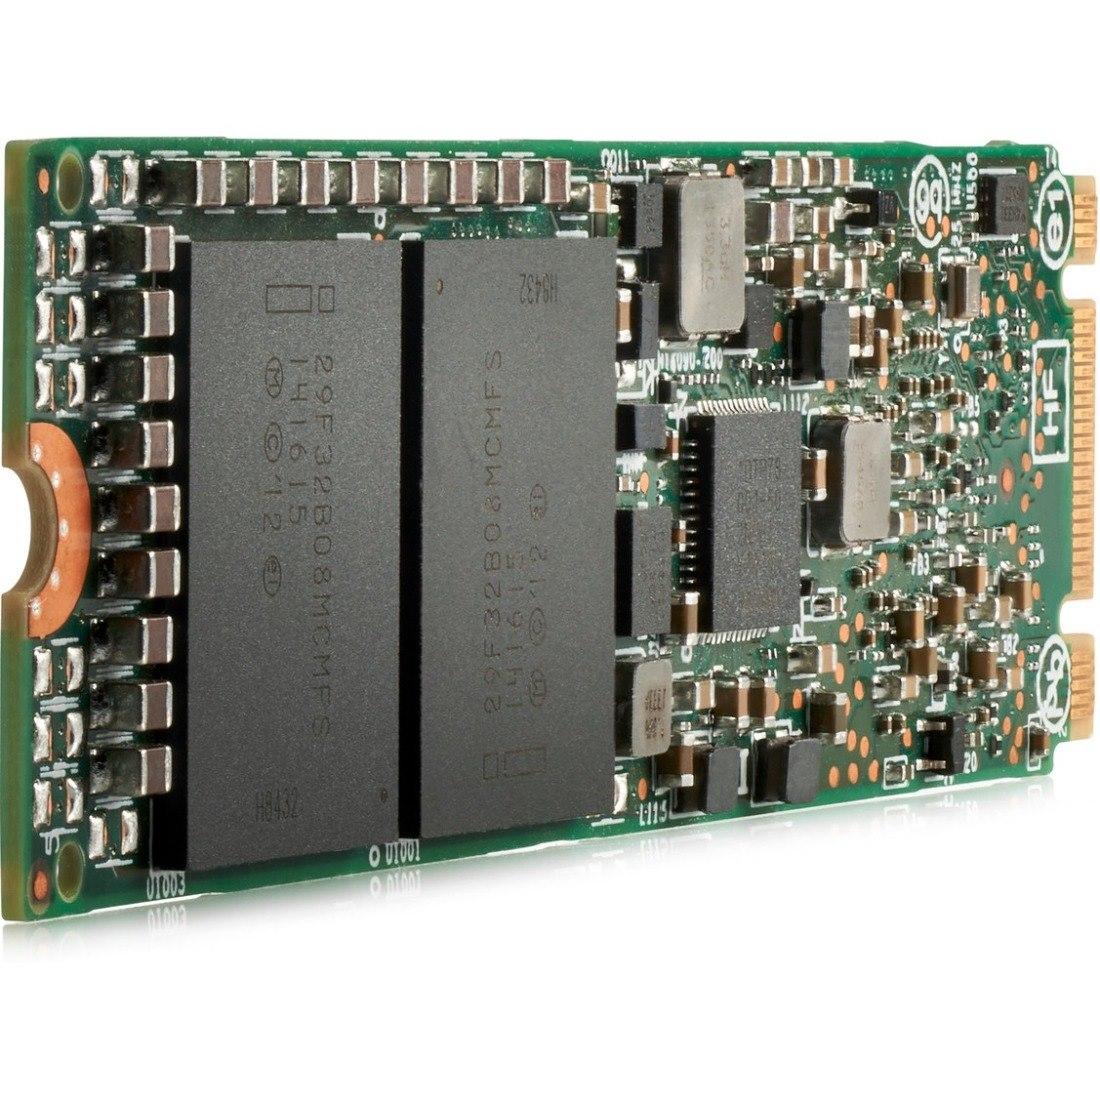 HPE 480 GB Solid State Drive - PCI Express (PCI Express x4) - Internal - M.2 22110